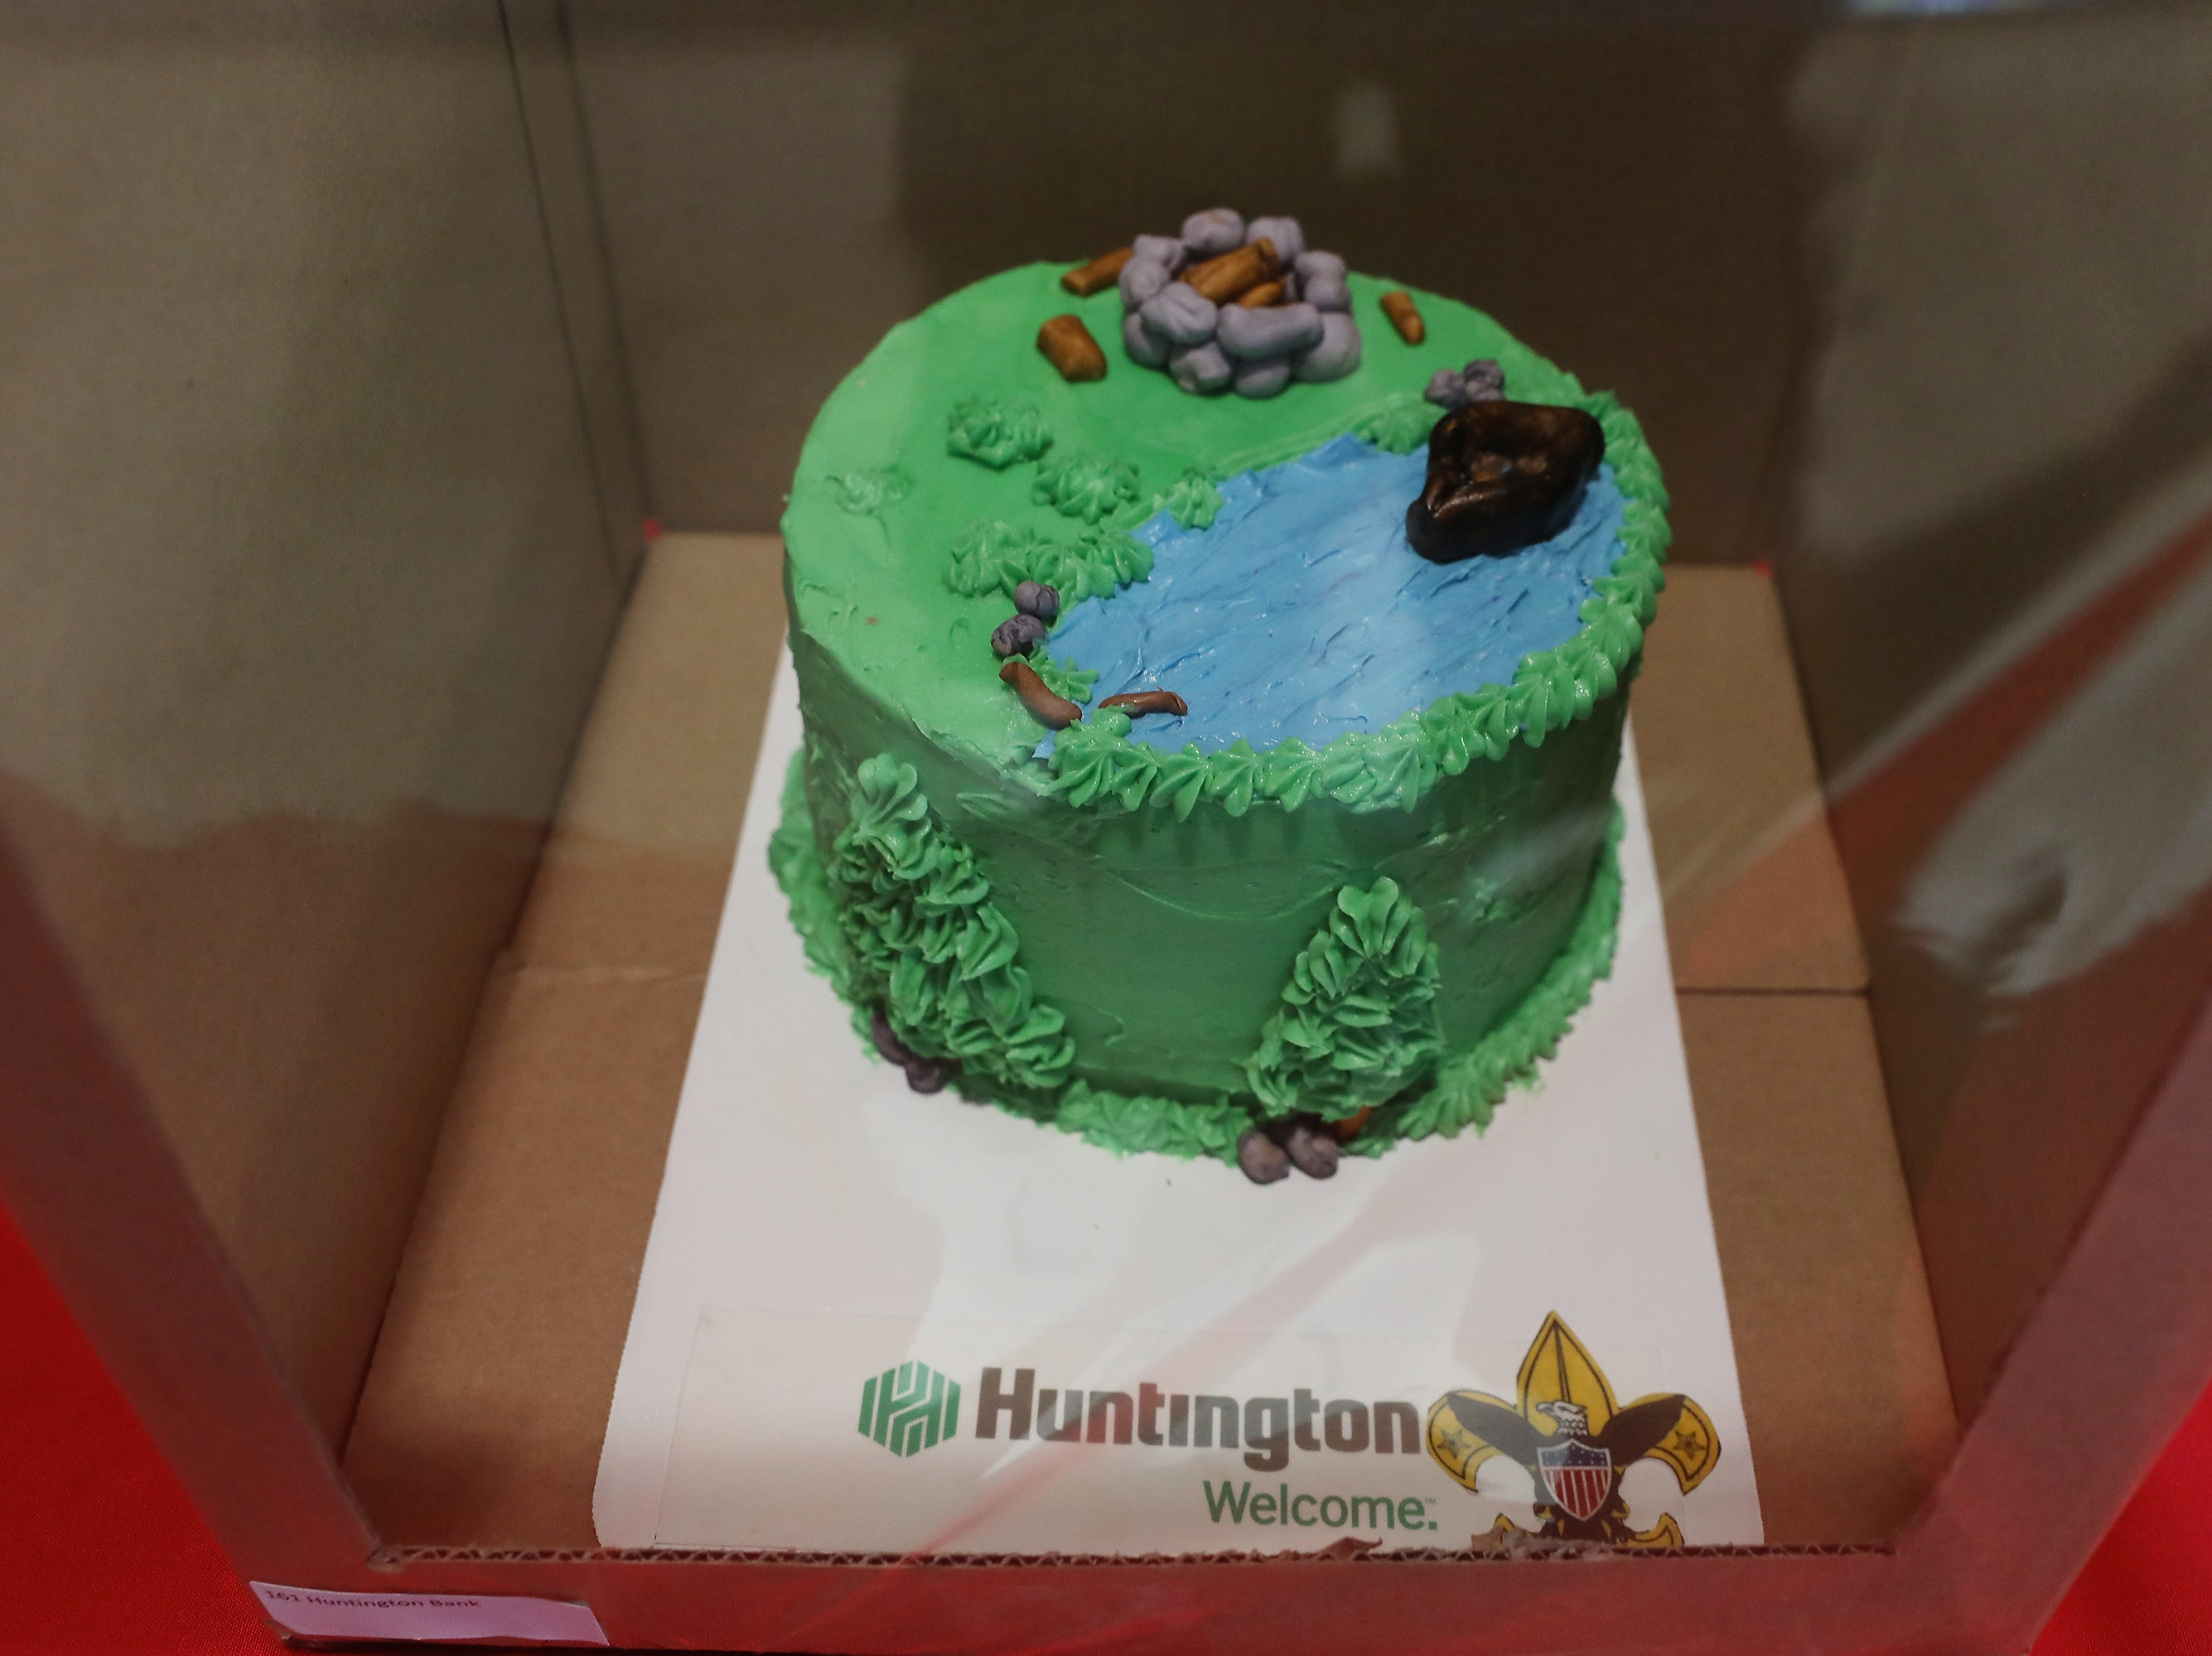 3:45 P.M. Thursday cake 161 Huntington Bank - Boy Scout popcorn, Scout Bucks; $375